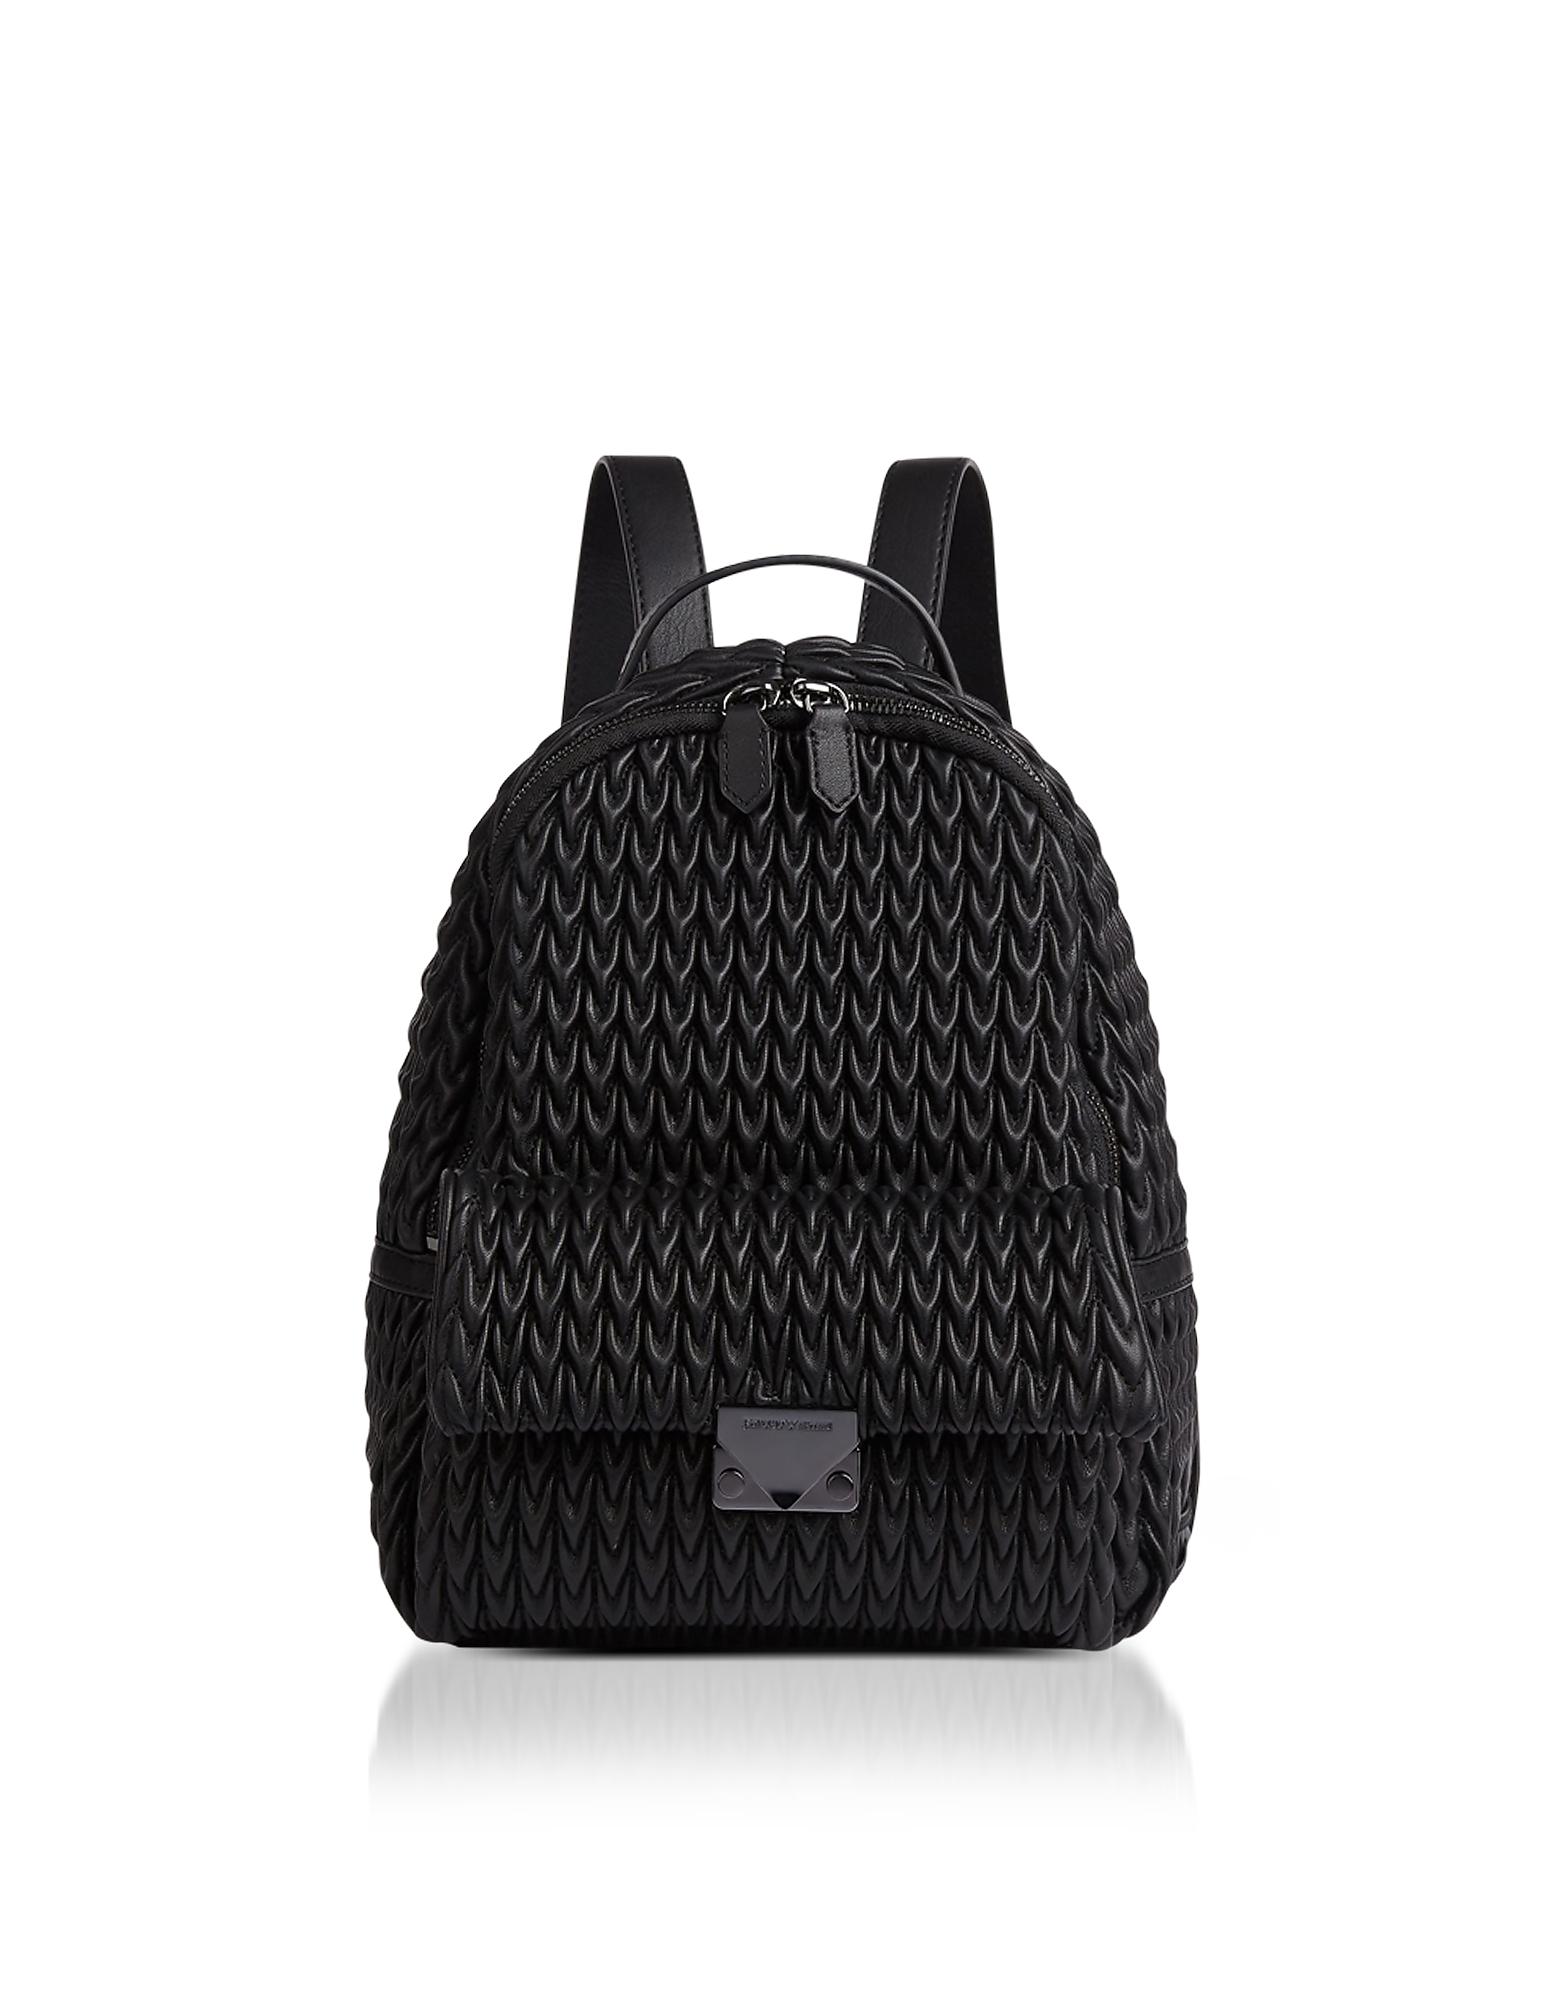 6fbcd07b16aa Стеганый Рюкзак из Эко-Кожи Y3L019YKT4I80001BLACK, цвет: чёрный ...